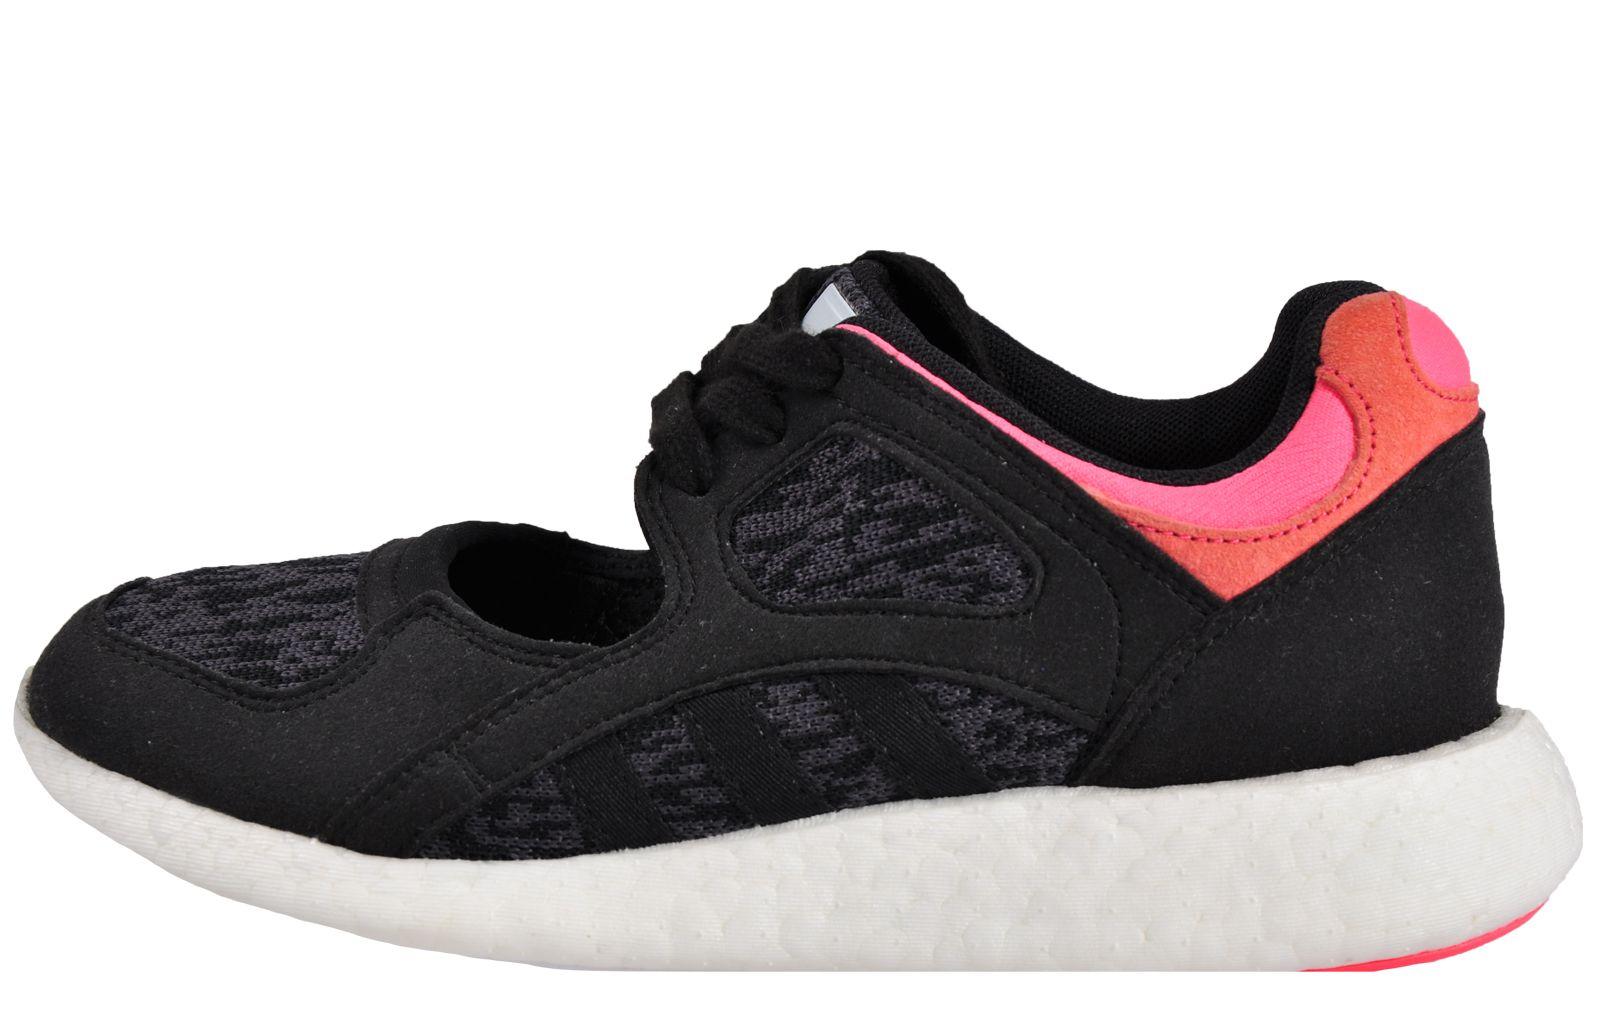 Adidas Originals Equipment Racing Boost 91/16 Womens Girls